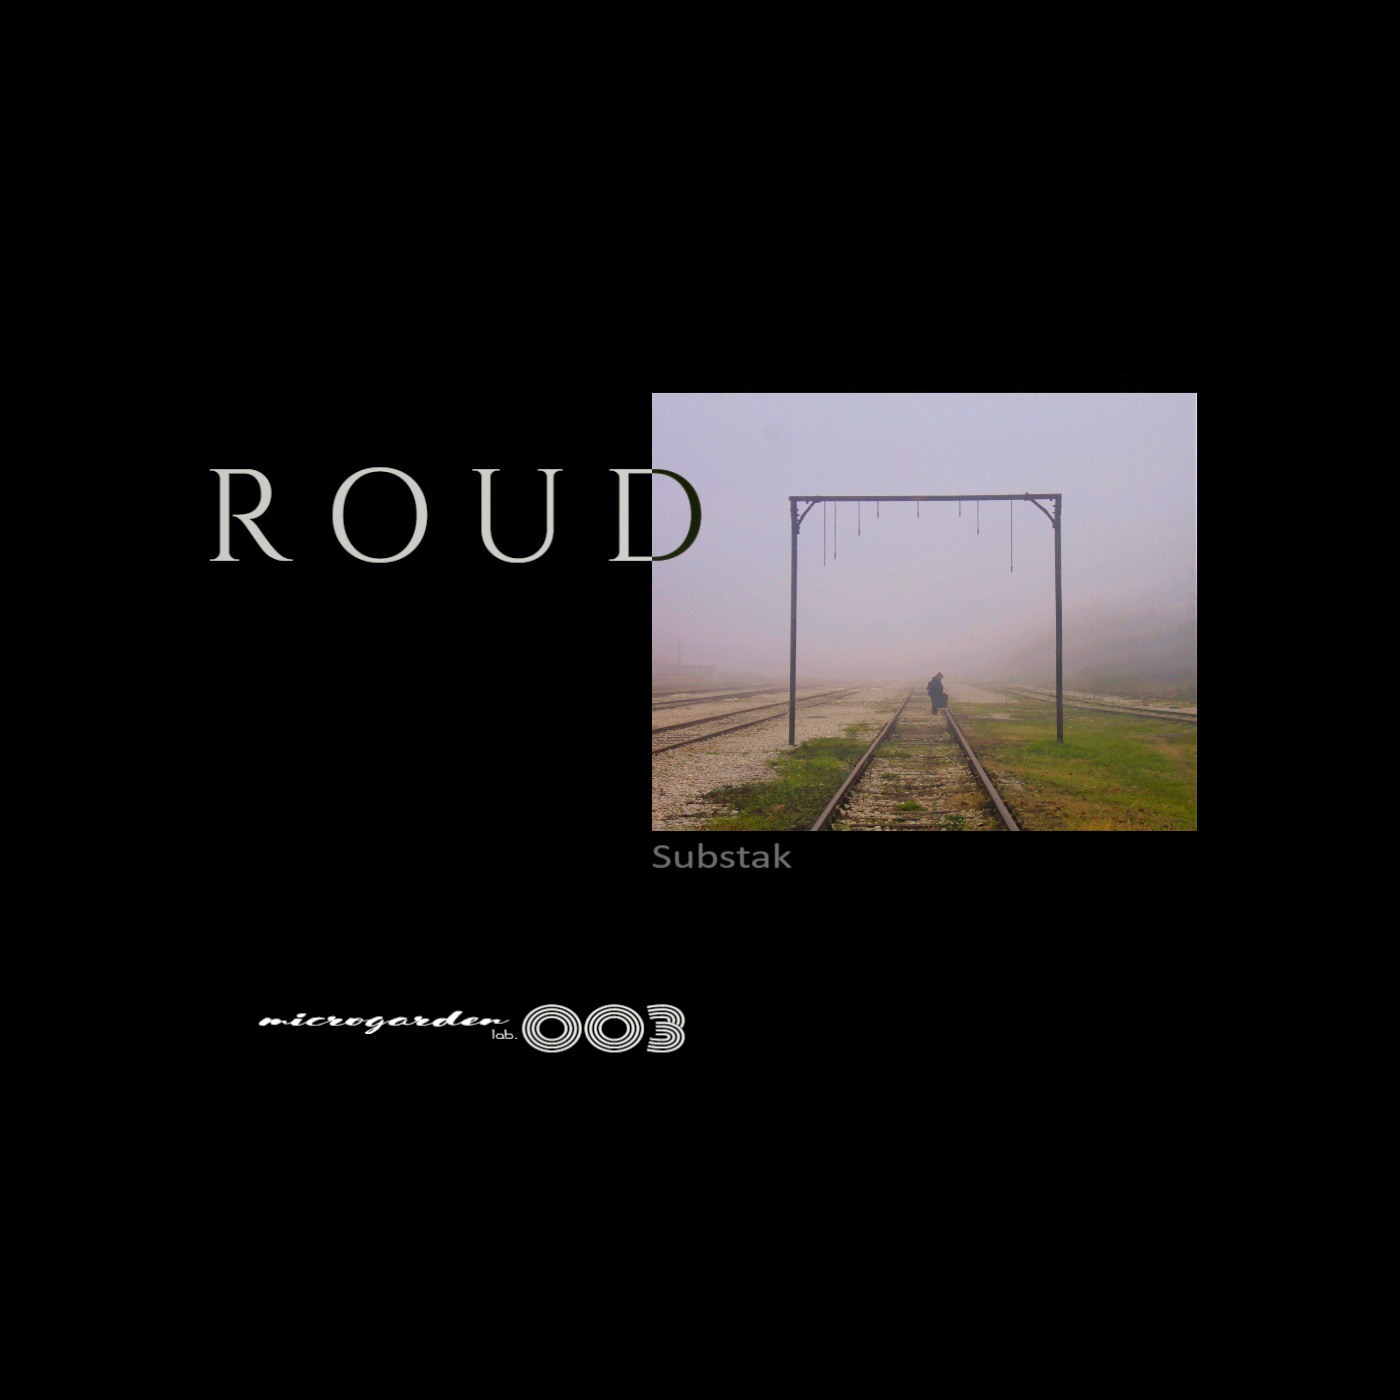 roudddd bcccc-db23aaa2